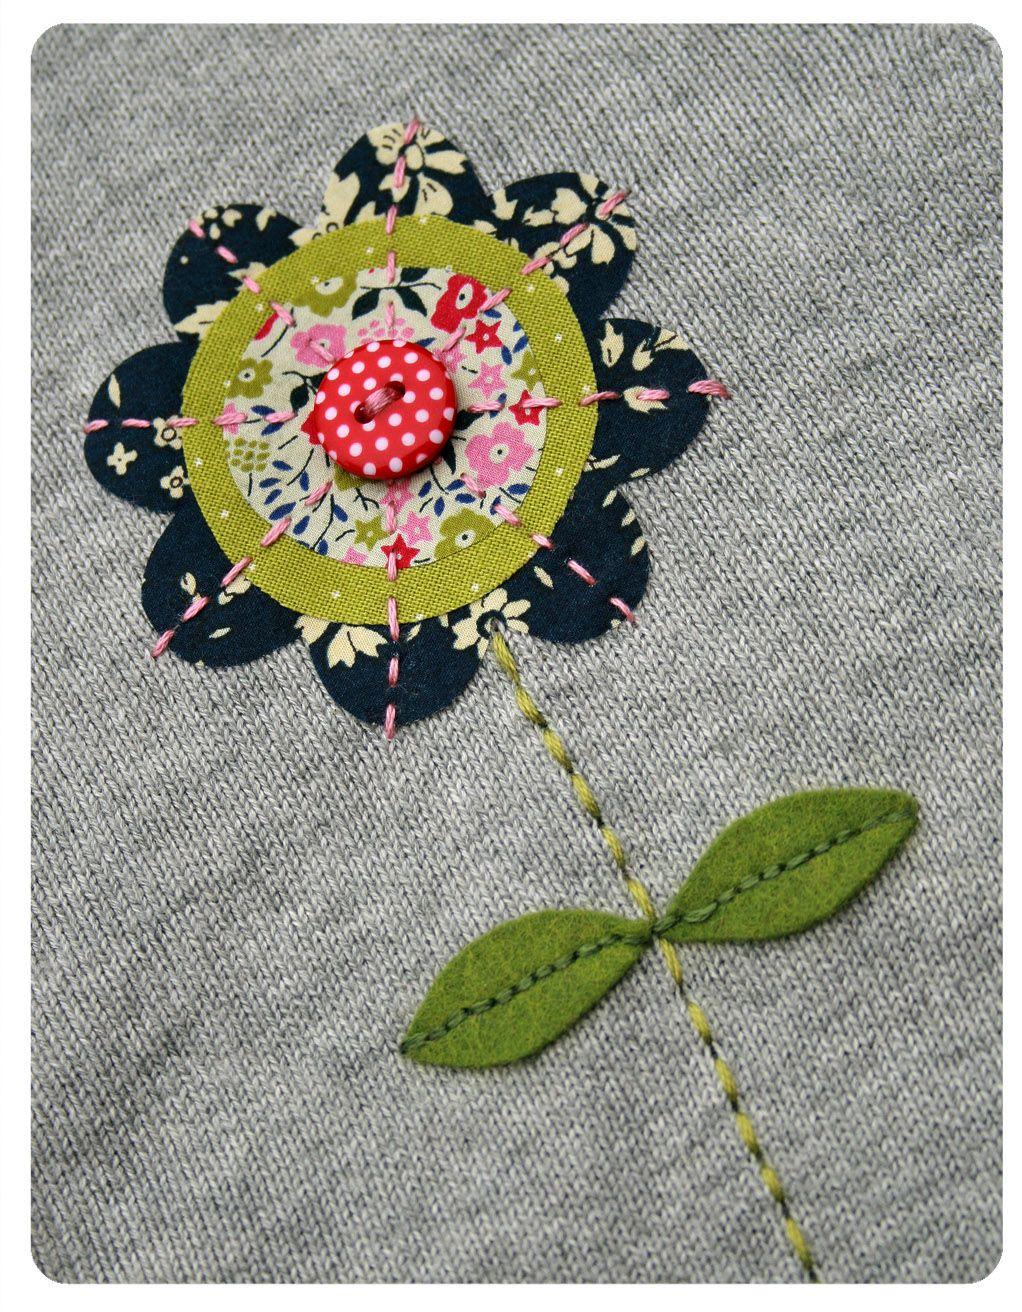 Blumen-Applikation | home sweet home | Pinterest | Blume applikation ...